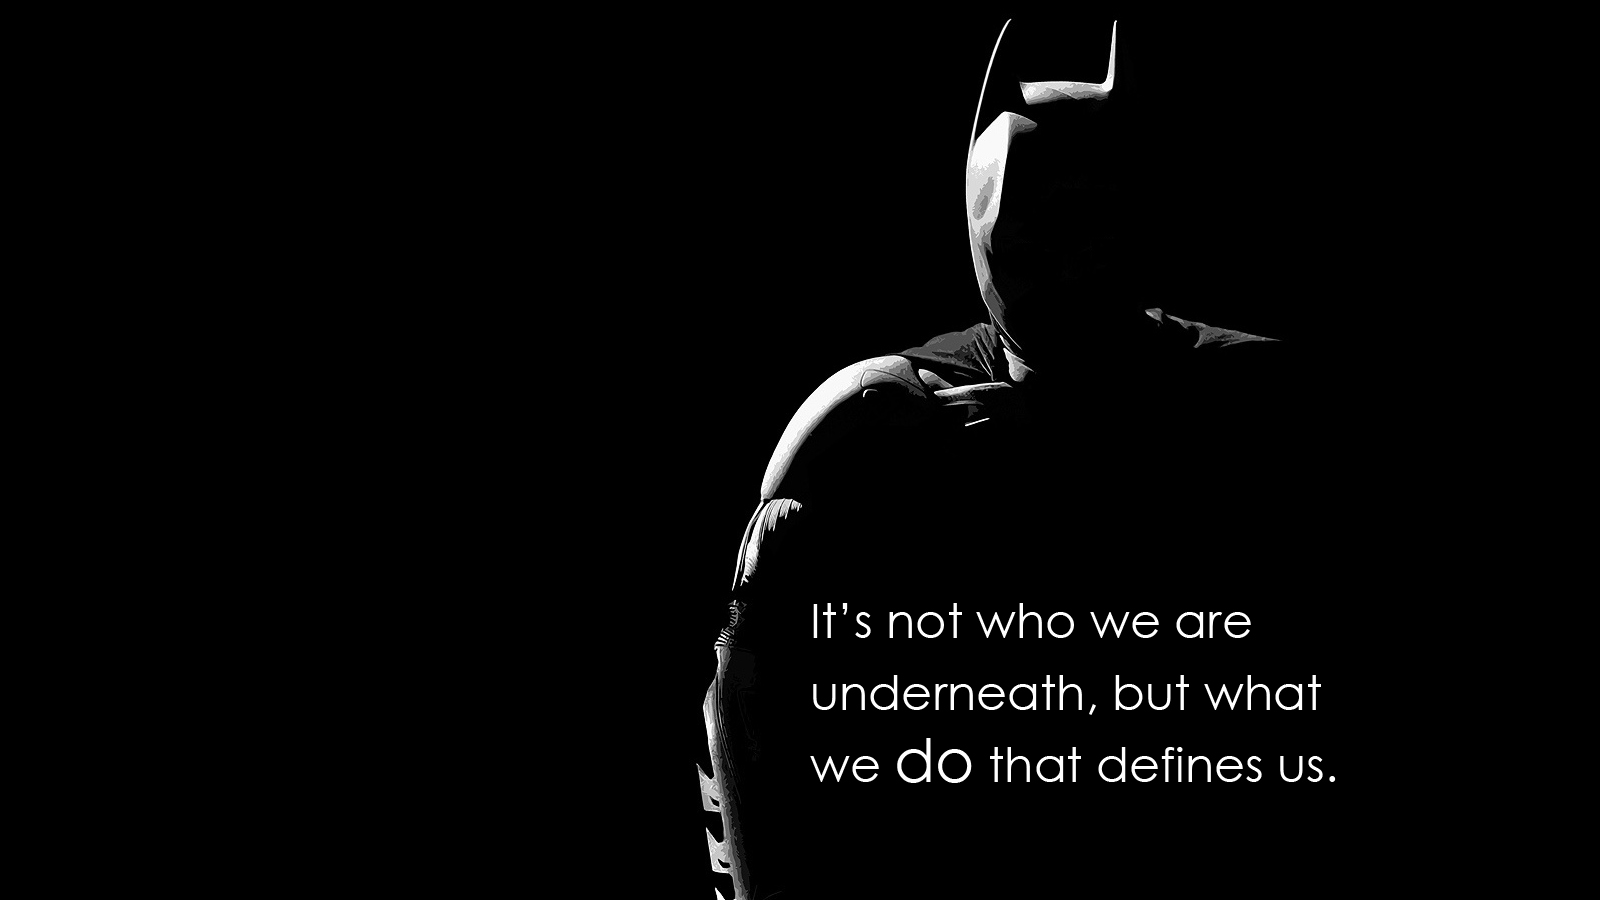 Batman quote #1